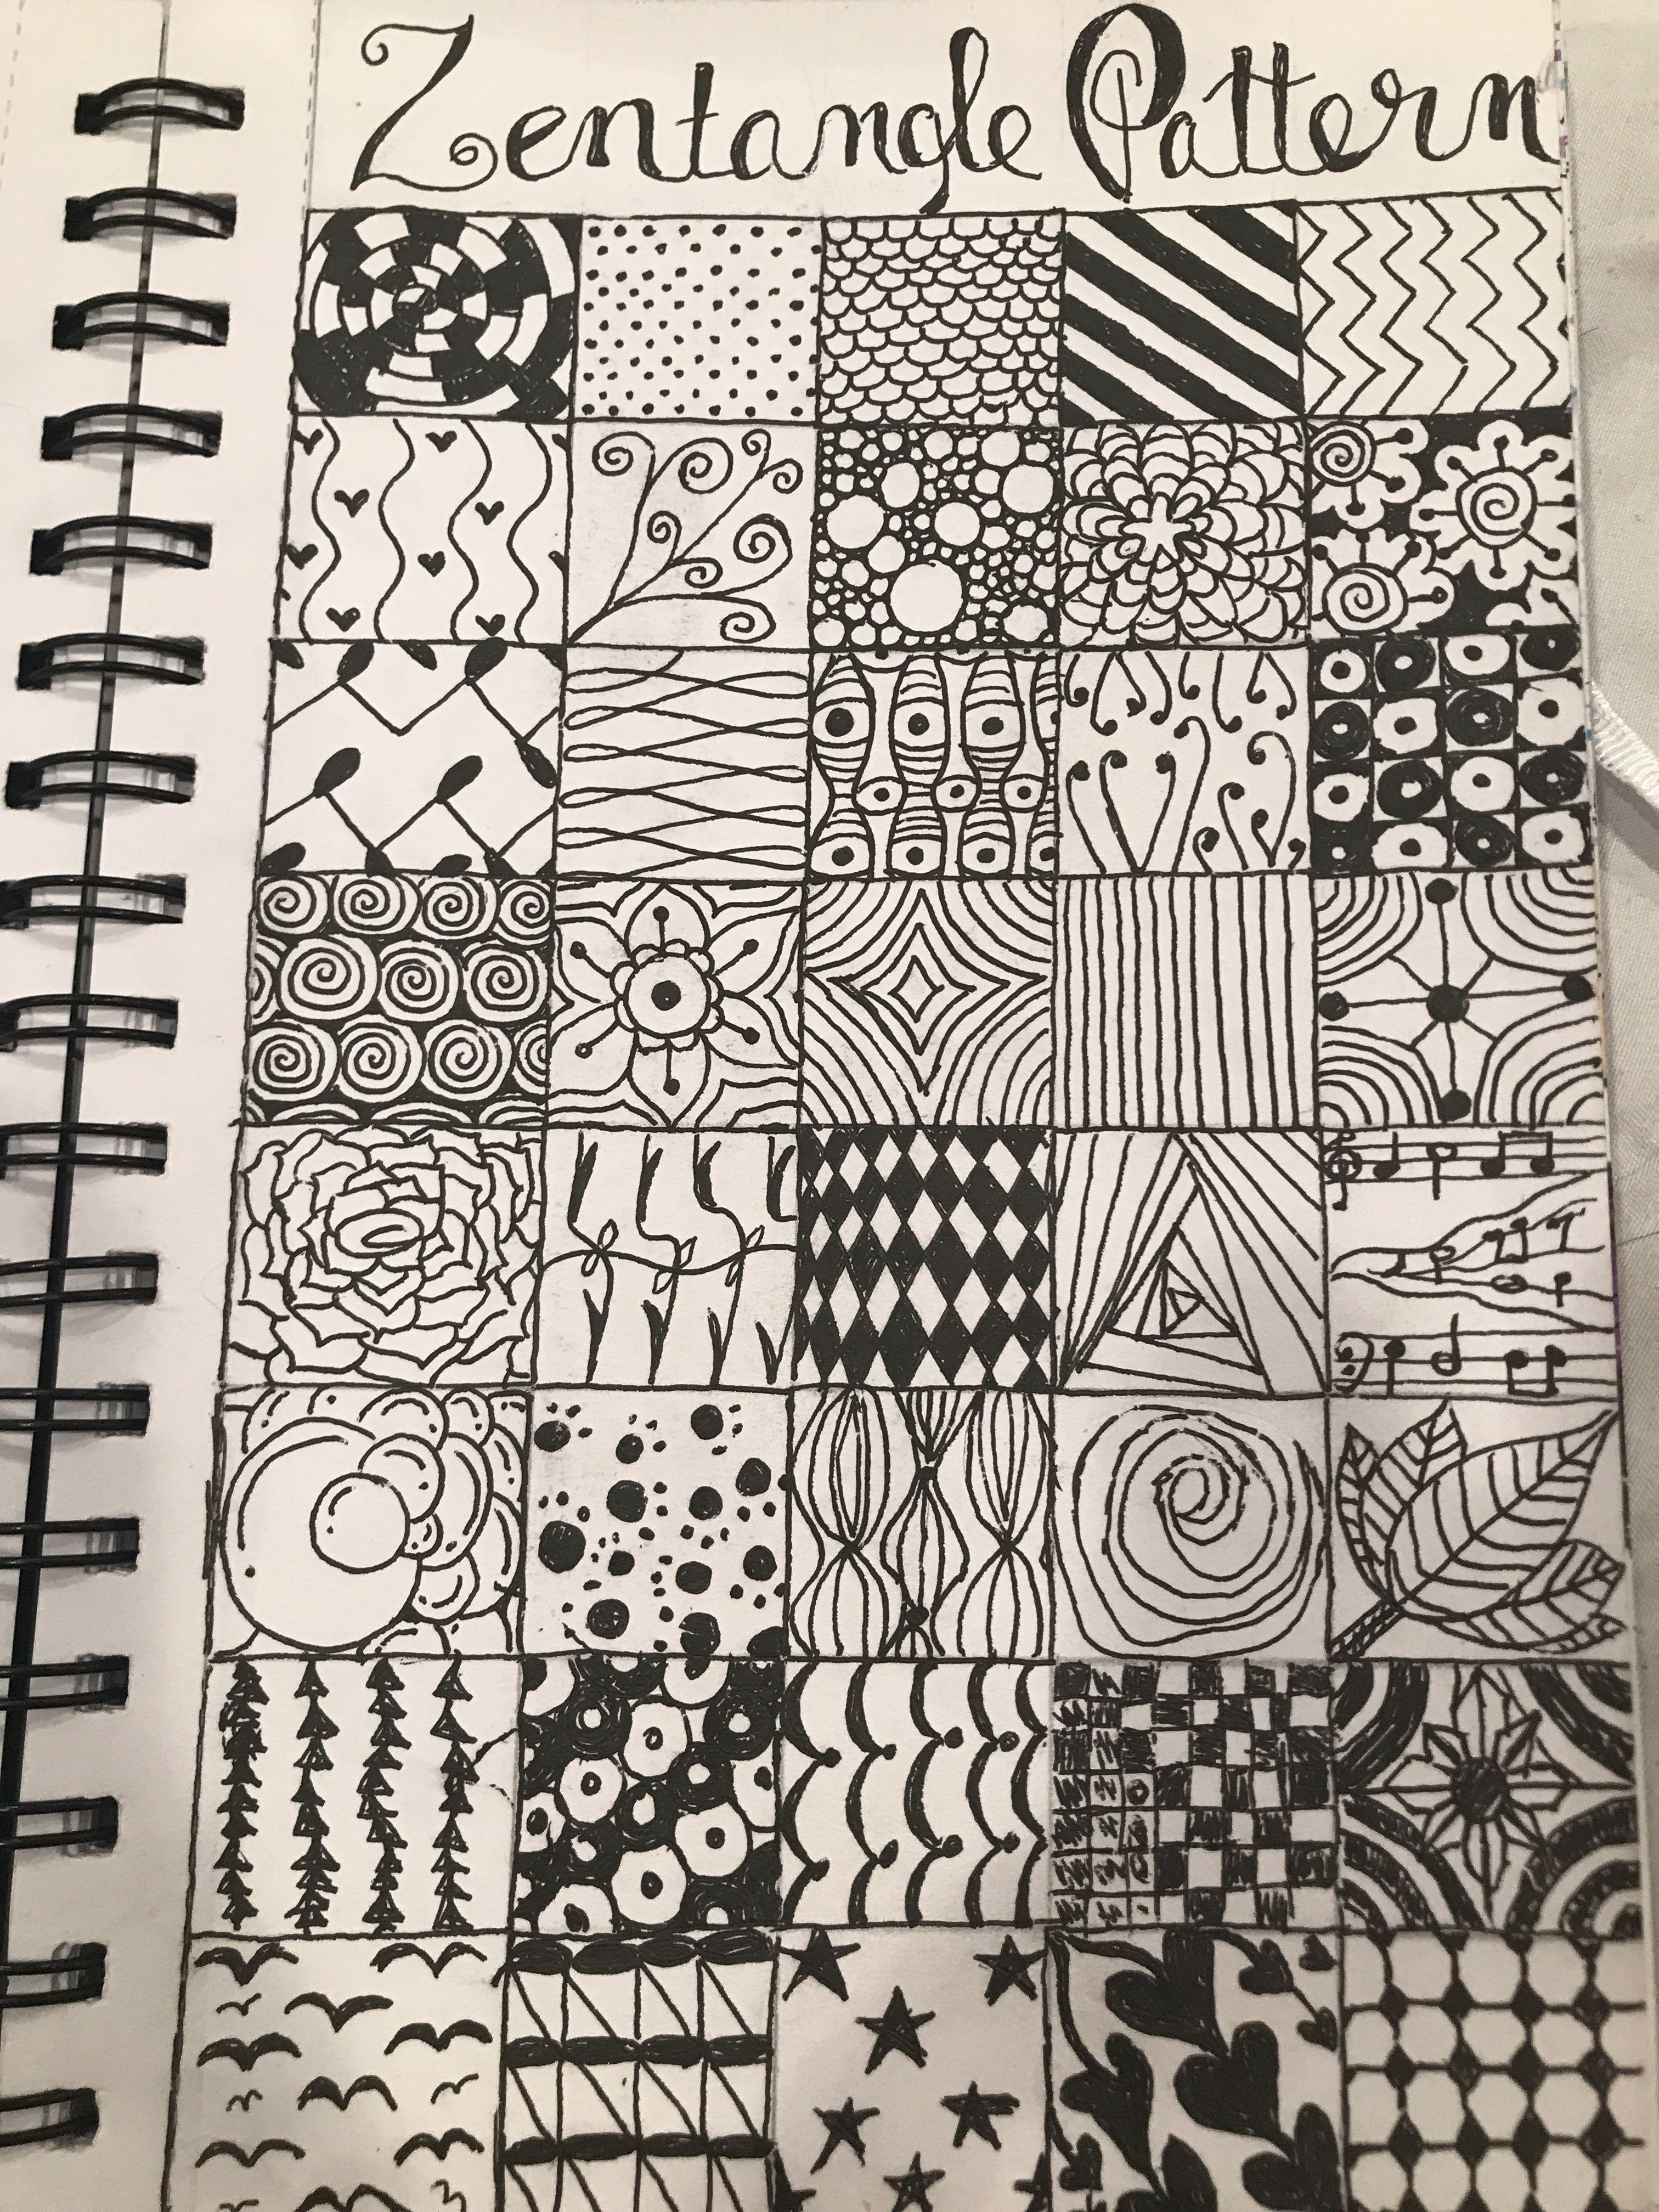 Original Zentangle Patterns Doodleart Zentangle Drawing Zentangle Patterns Zentangle Doodle Art Designs